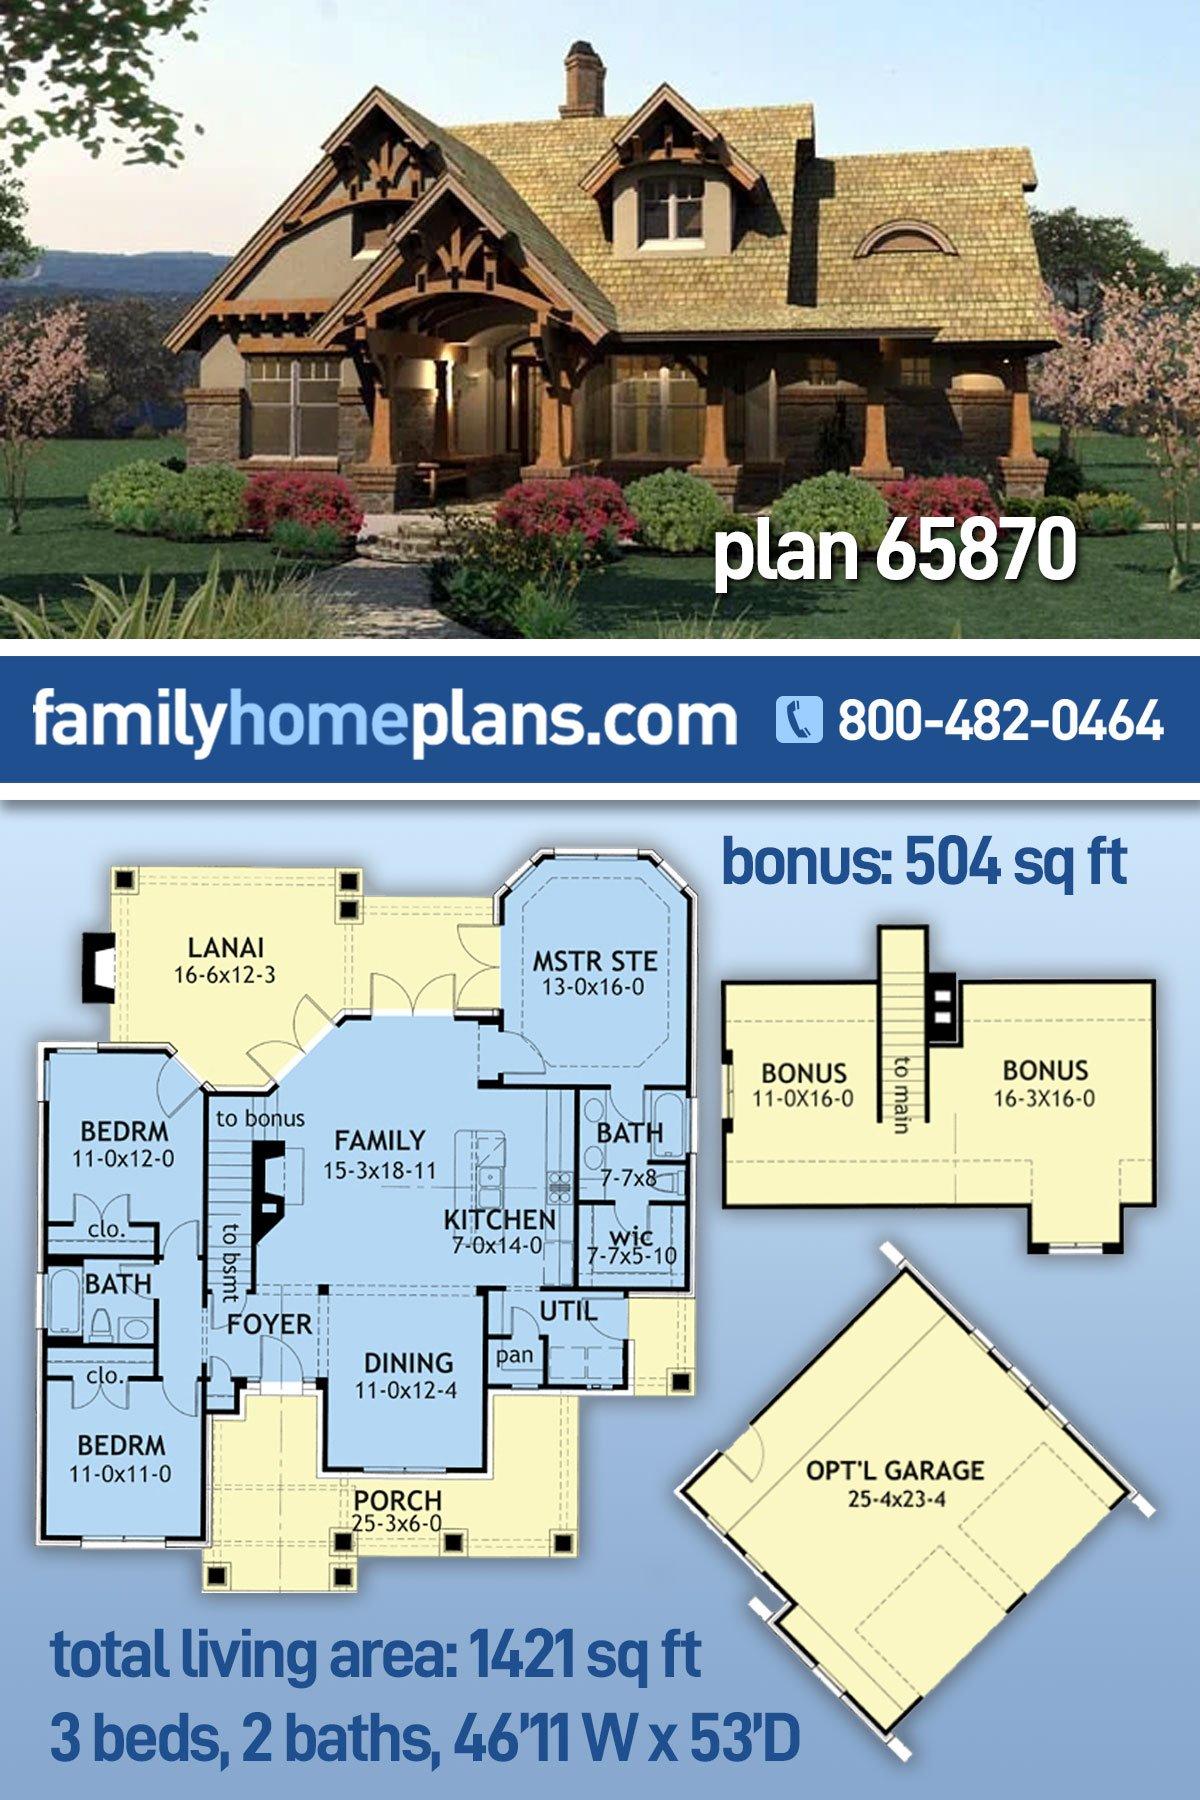 Bungalow, Cottage, Craftsman, Tuscan House Plan 65870 with 3 Beds, 2 Baths, 2 Car Garage